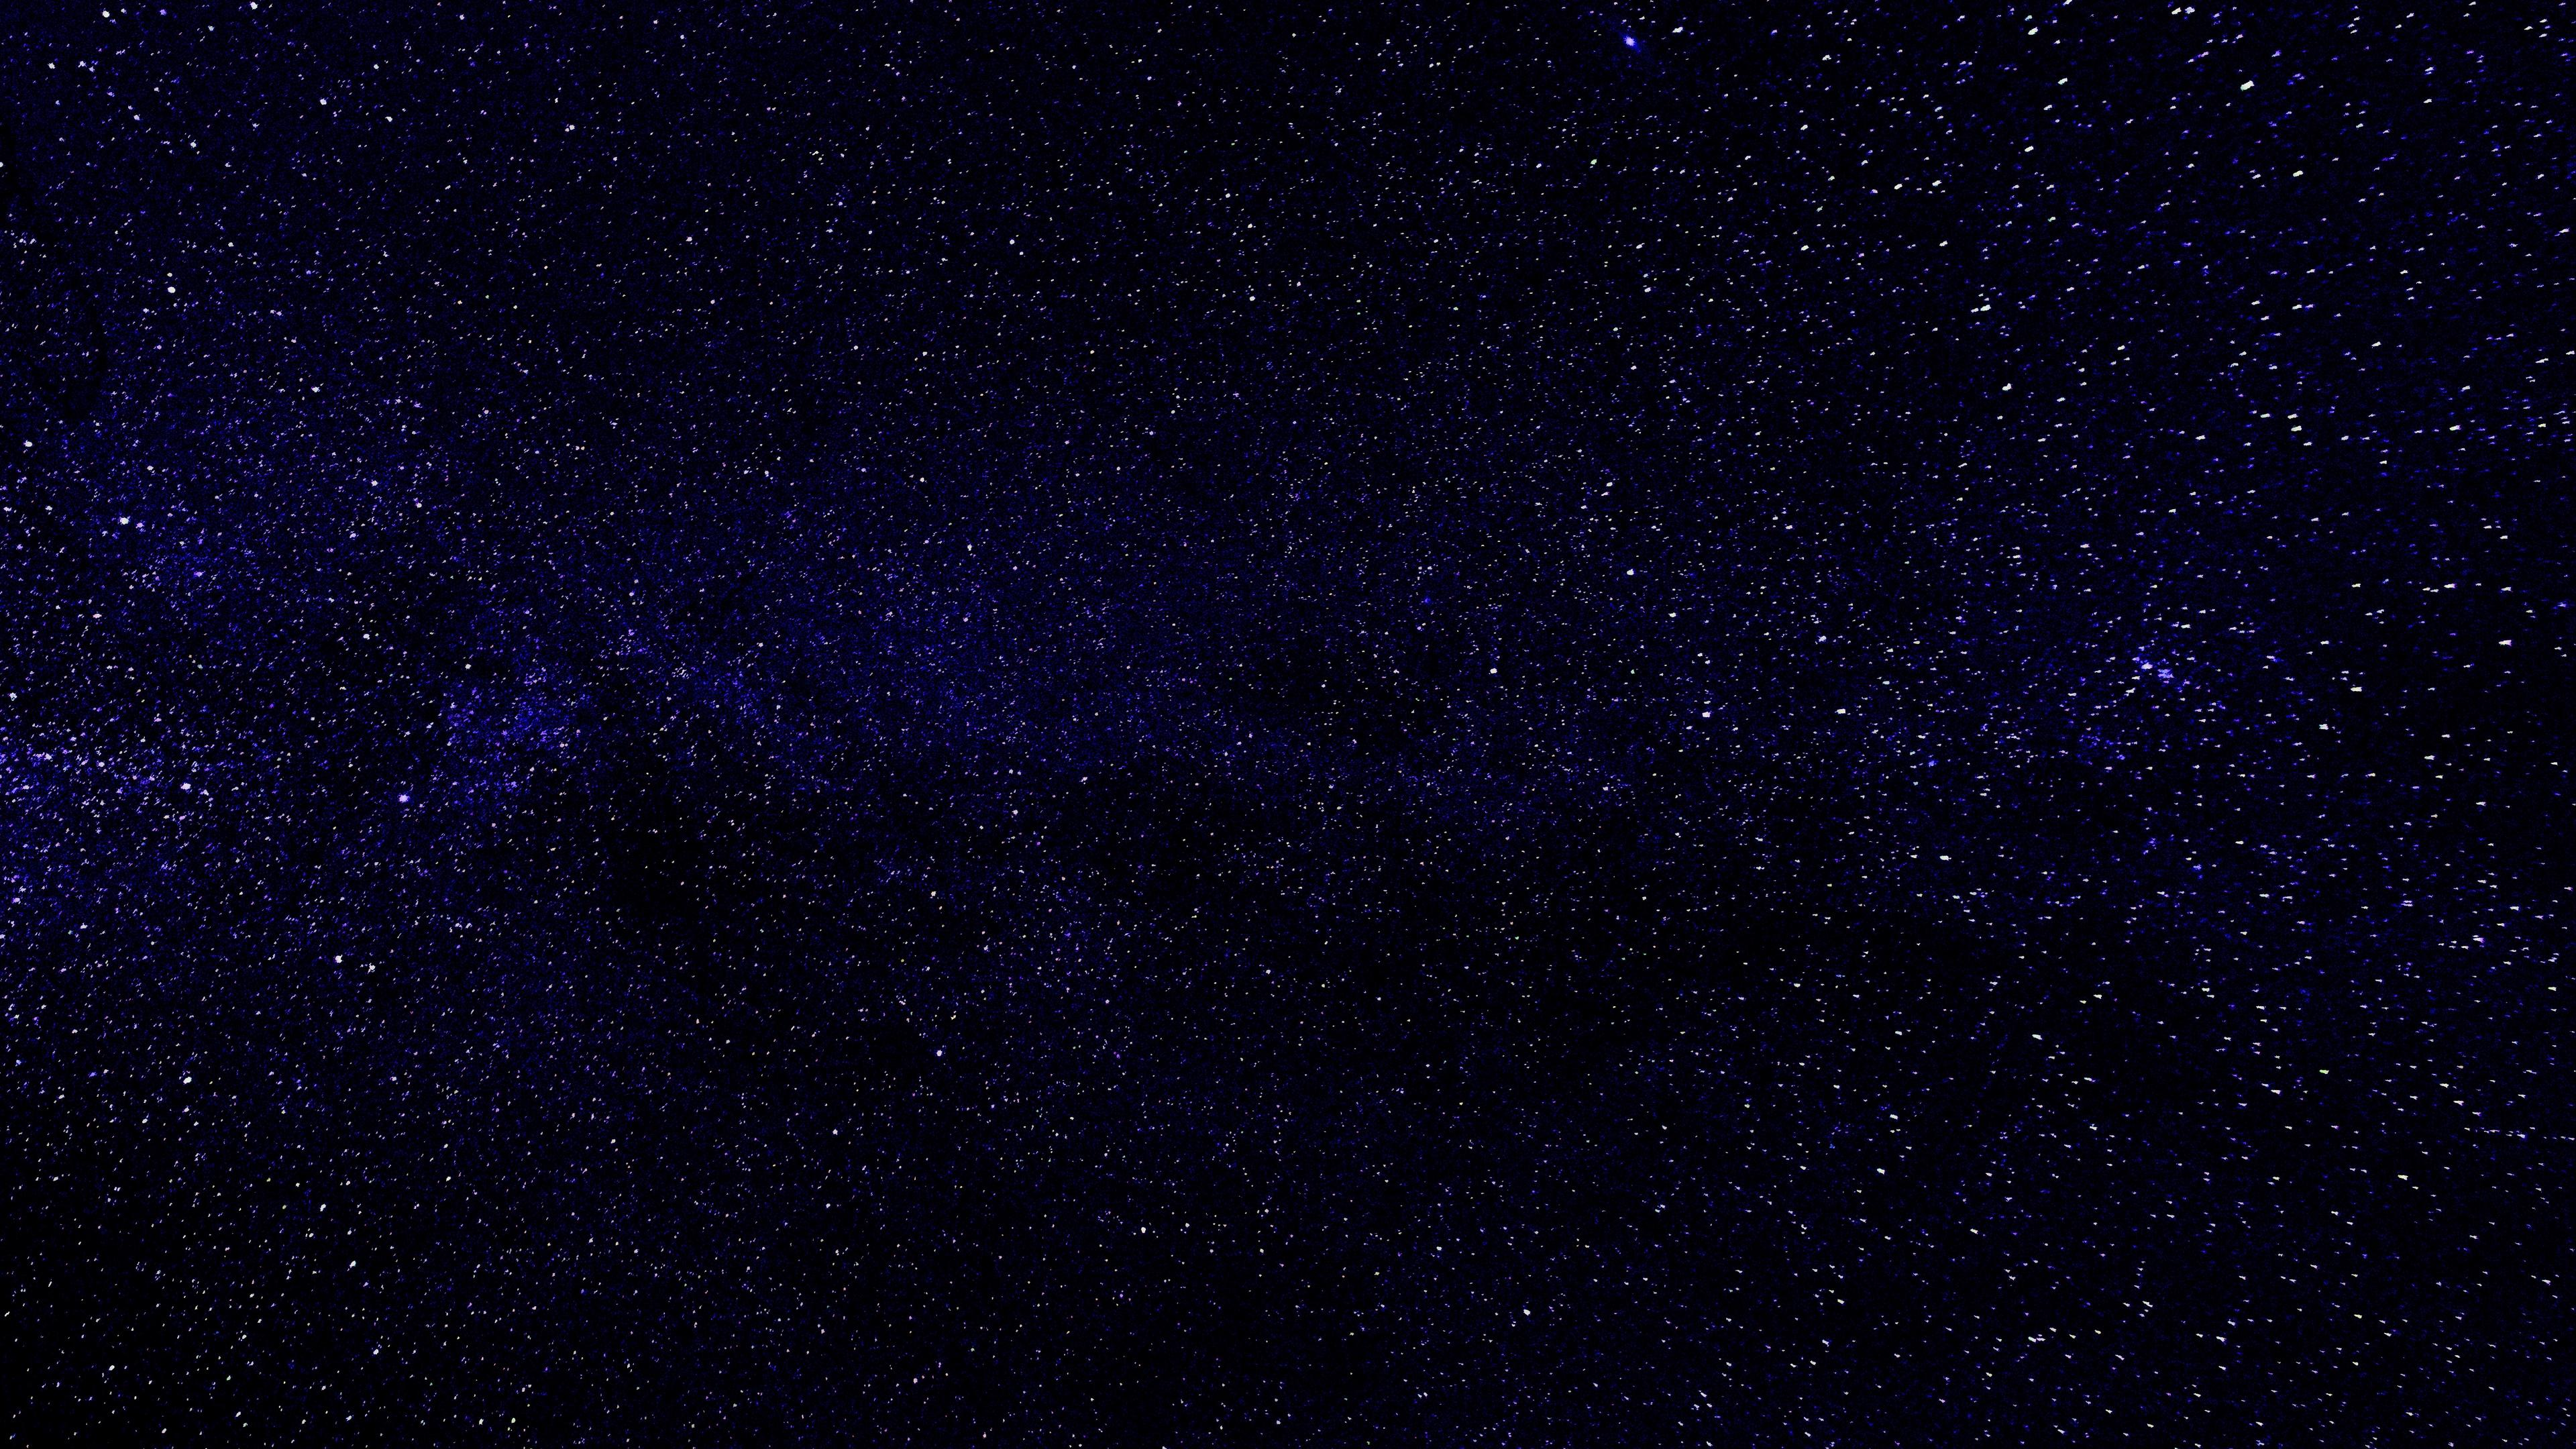 Stars galaxy milky way starry sky night sky 4k stars - Starry sky 4k ...